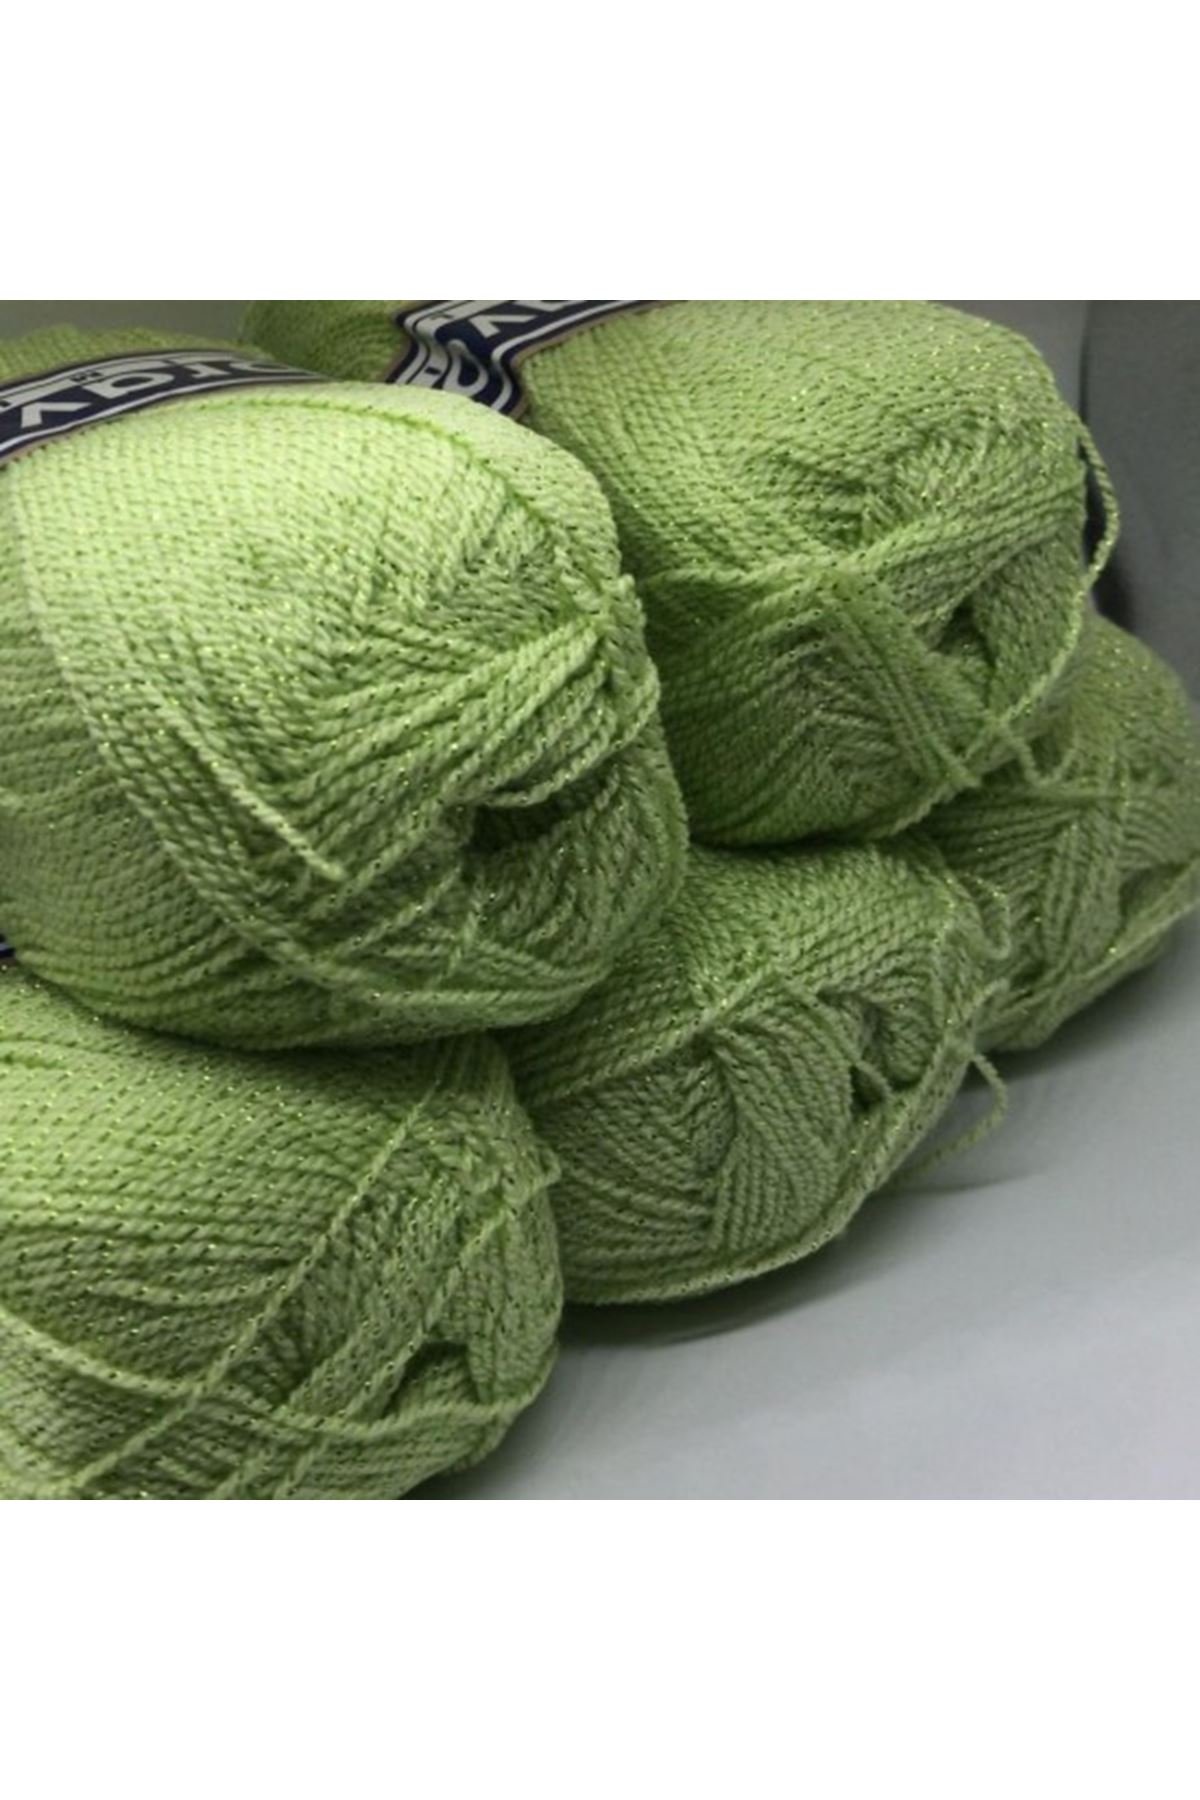 Simli Paket 2 - Soluk Yeşil